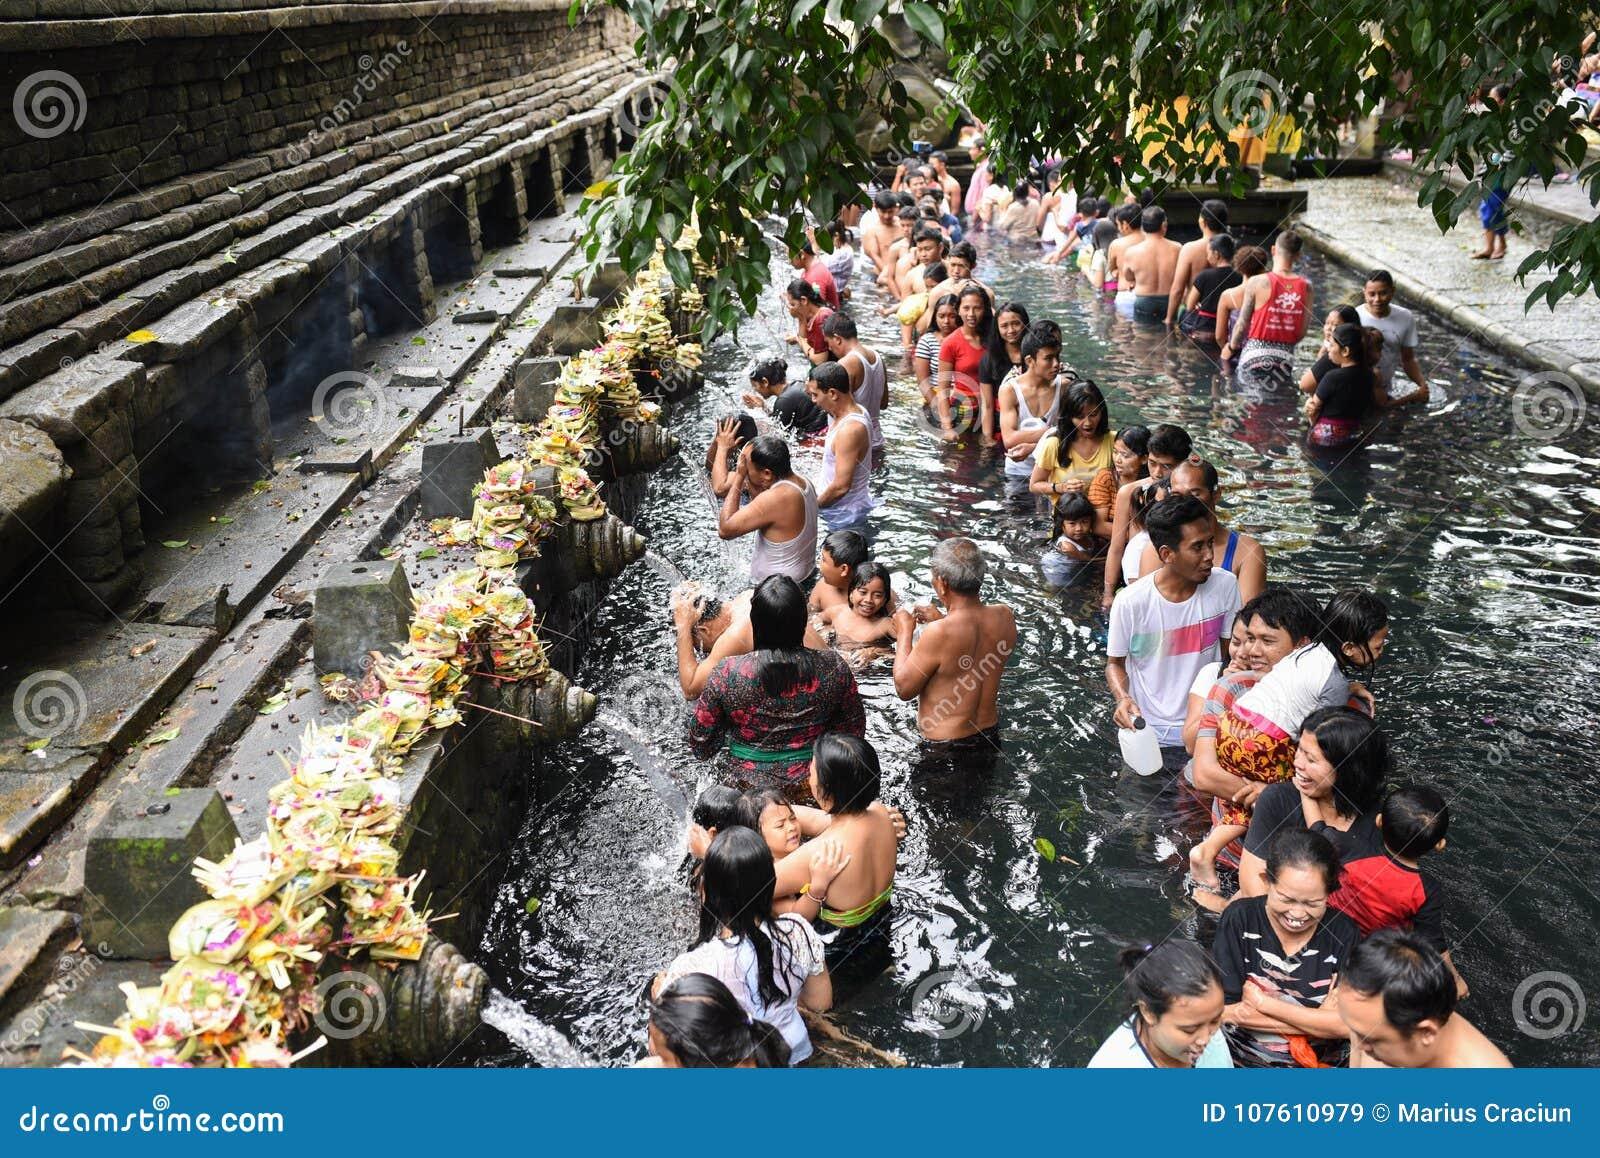 Ritual Bathing at Puru Tirtha Empul, Bali